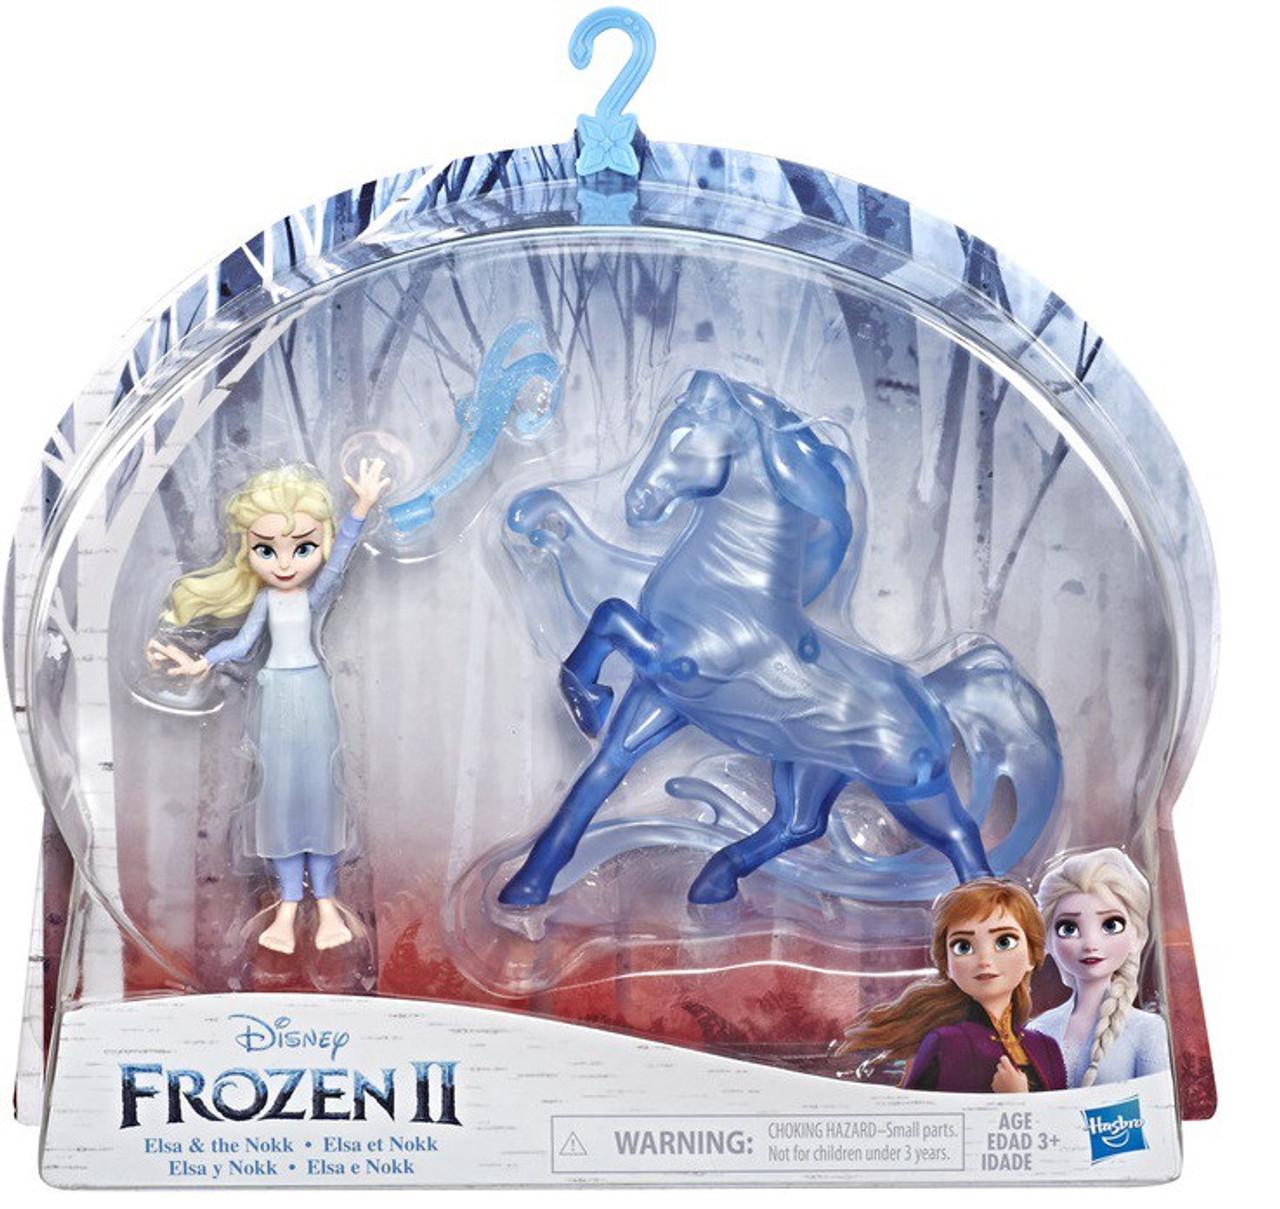 Disney Frozen 2 Elsa & The Nokk Small Dolls 2-Pack